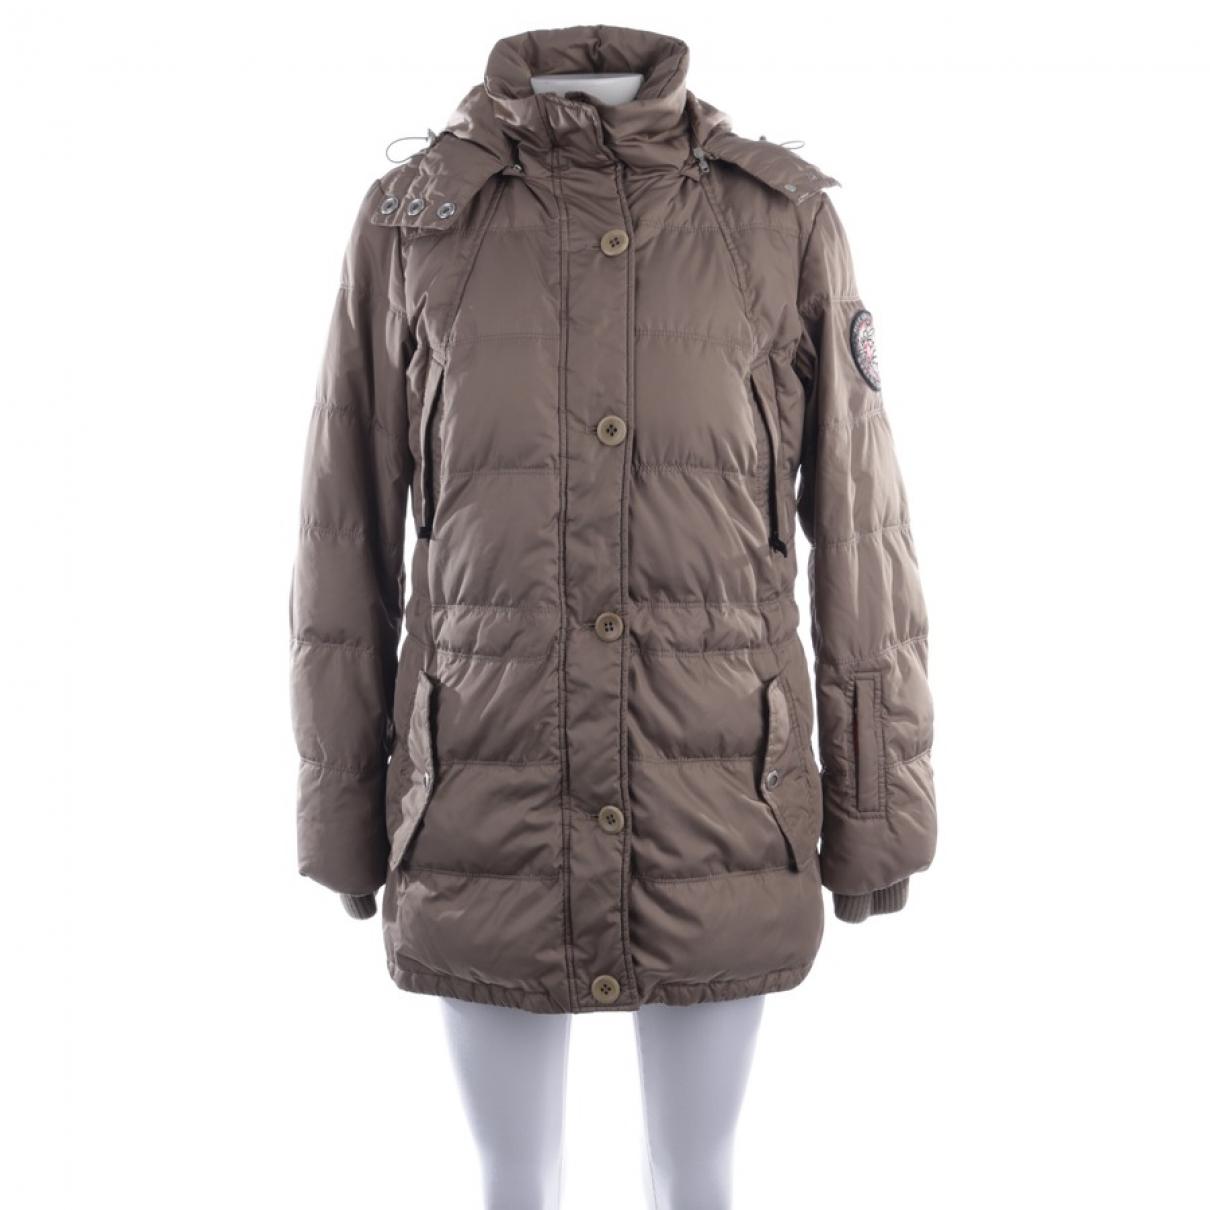 Bogner \N Beige jacket for Women M International